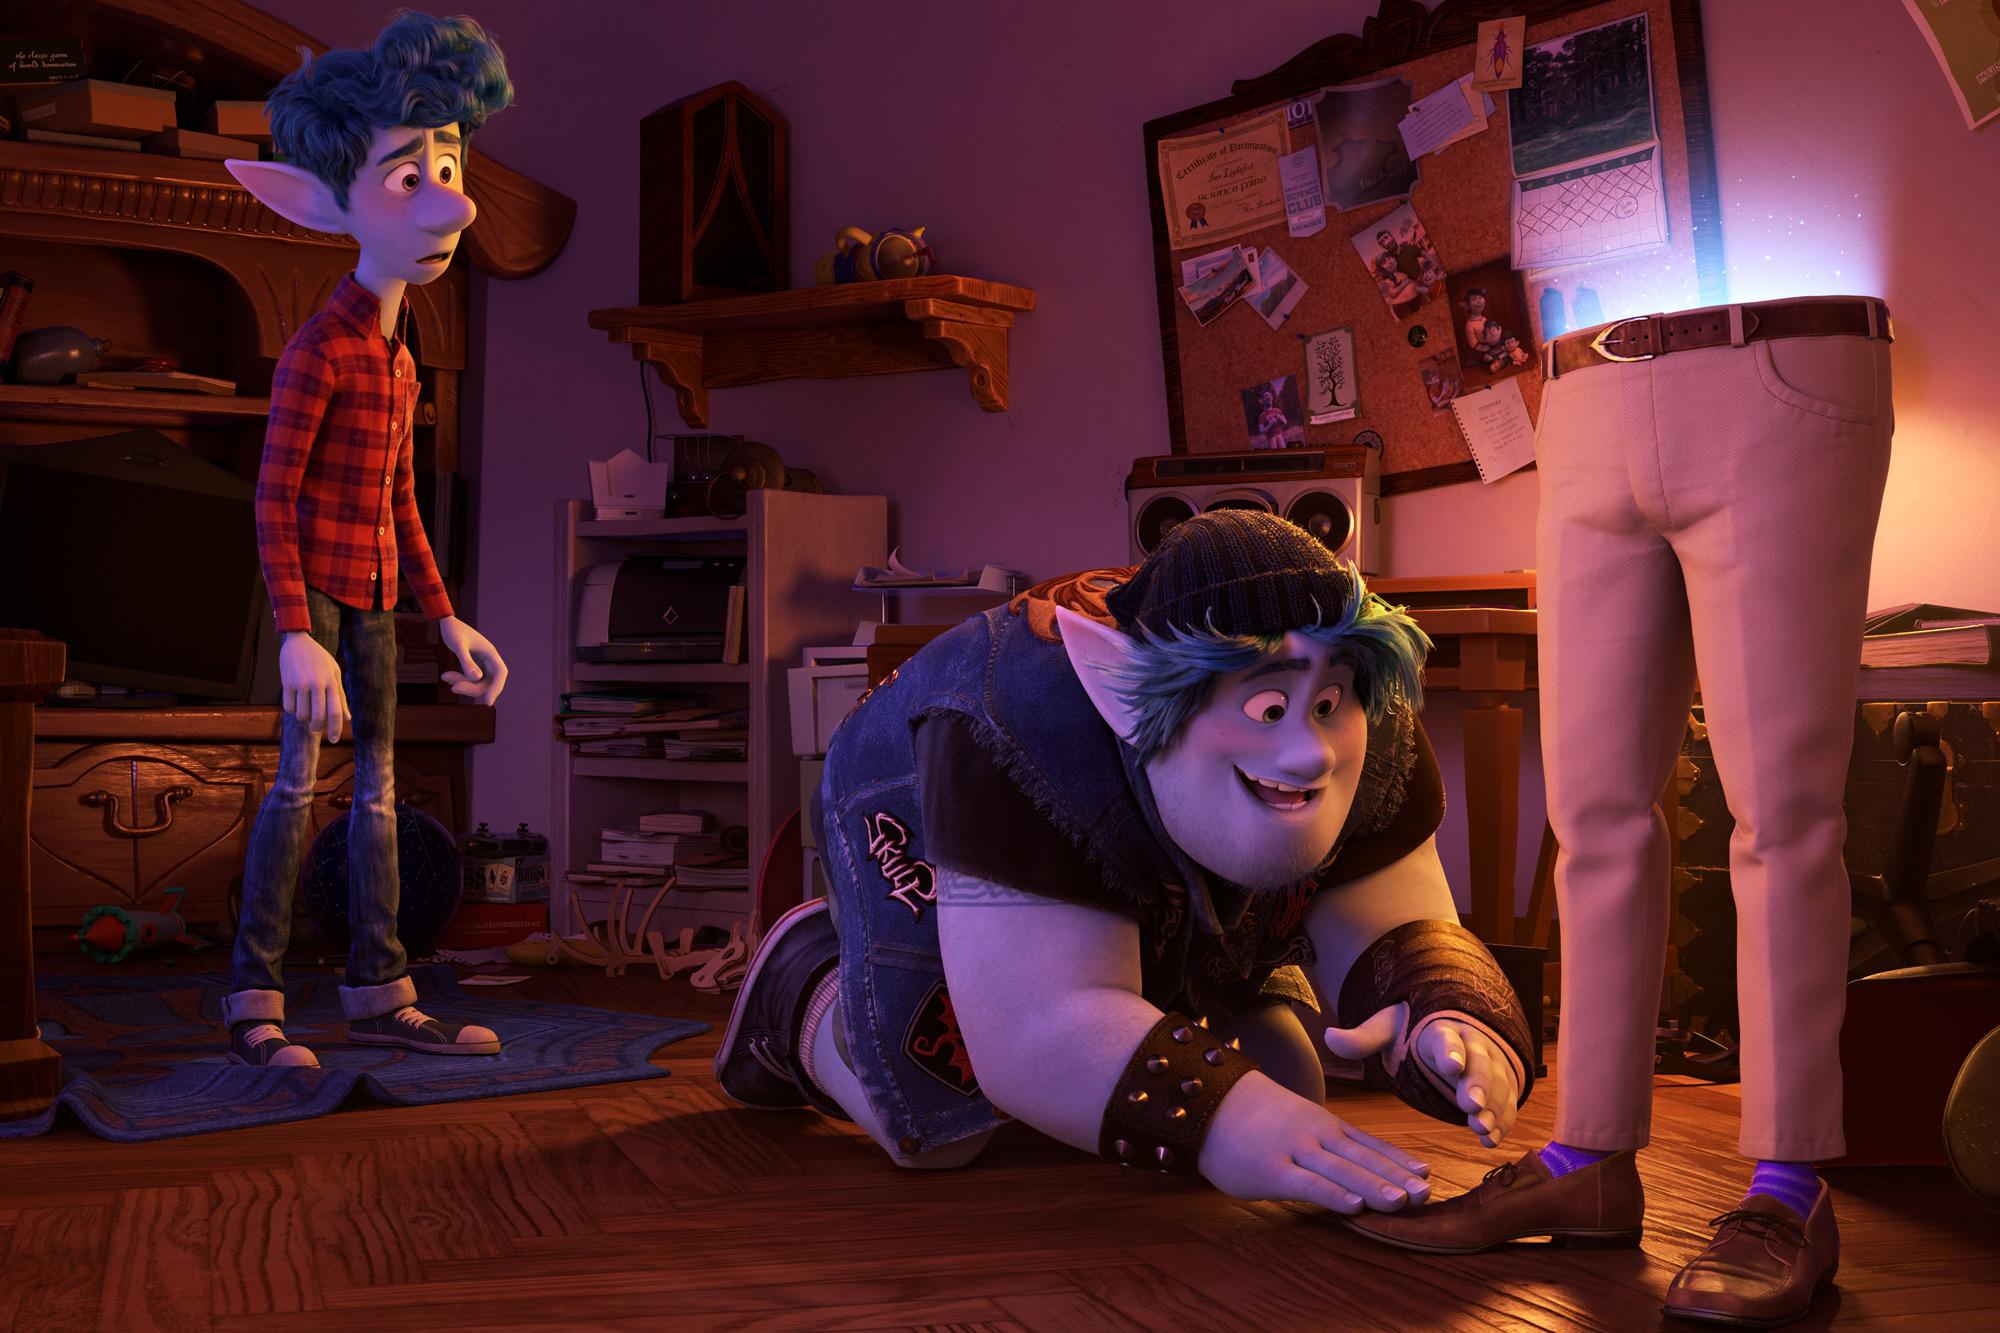 Onward blu ray' Review: Pixar's Elf-Family Fantasy's Light on Company's ...